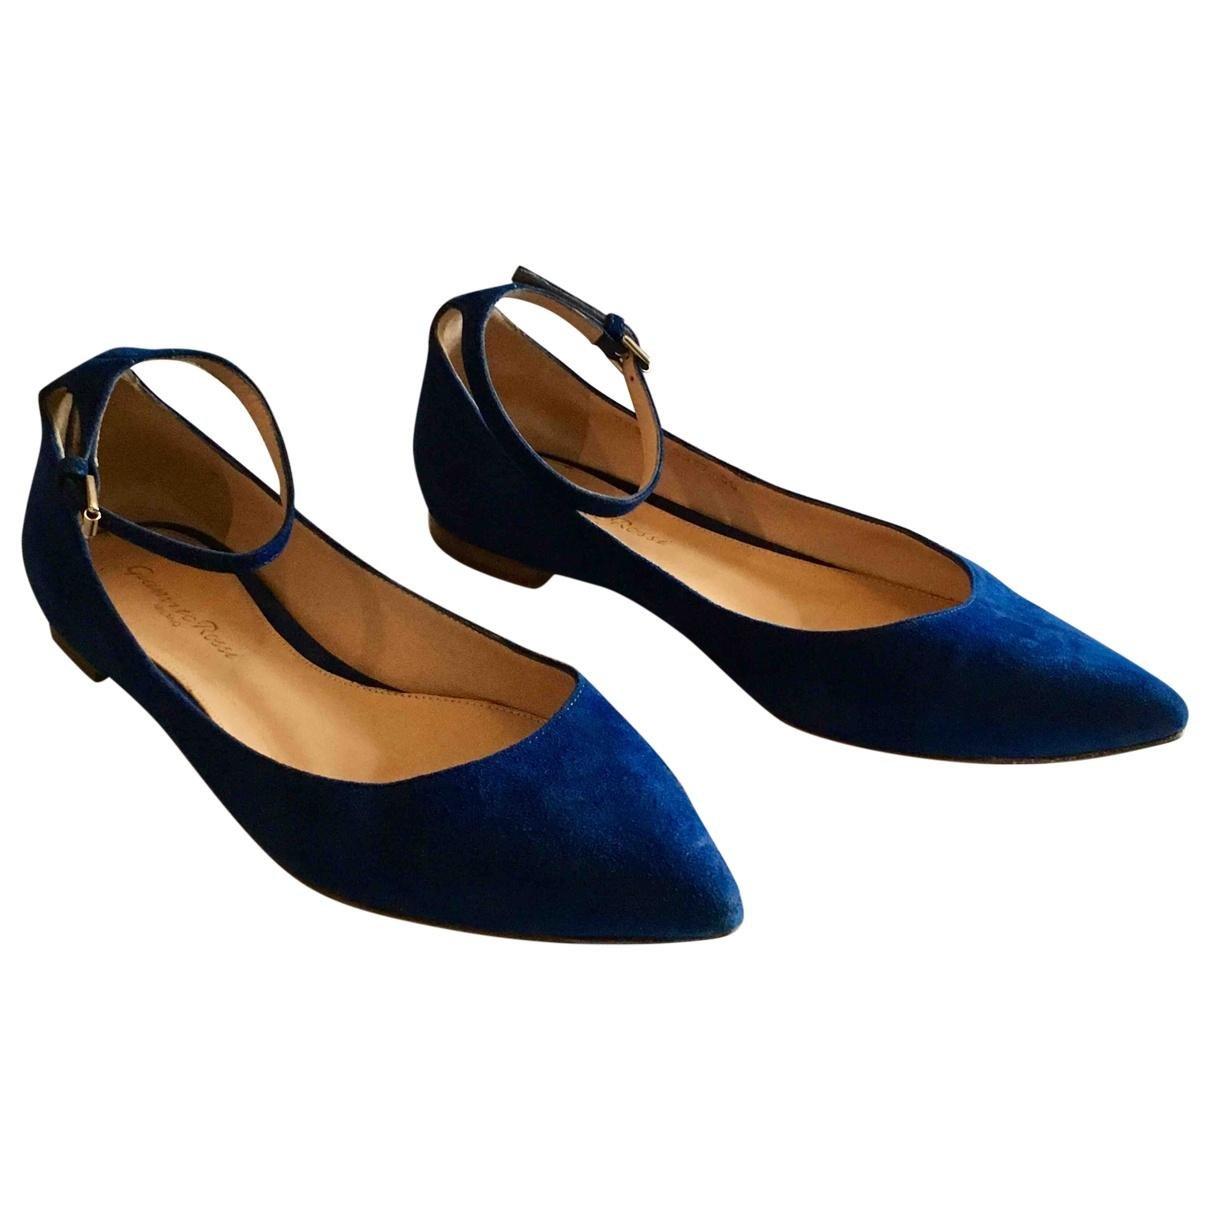 060e62bb7f35b2 Lyst - Gianvito Rossi Ballet Flats in Blue